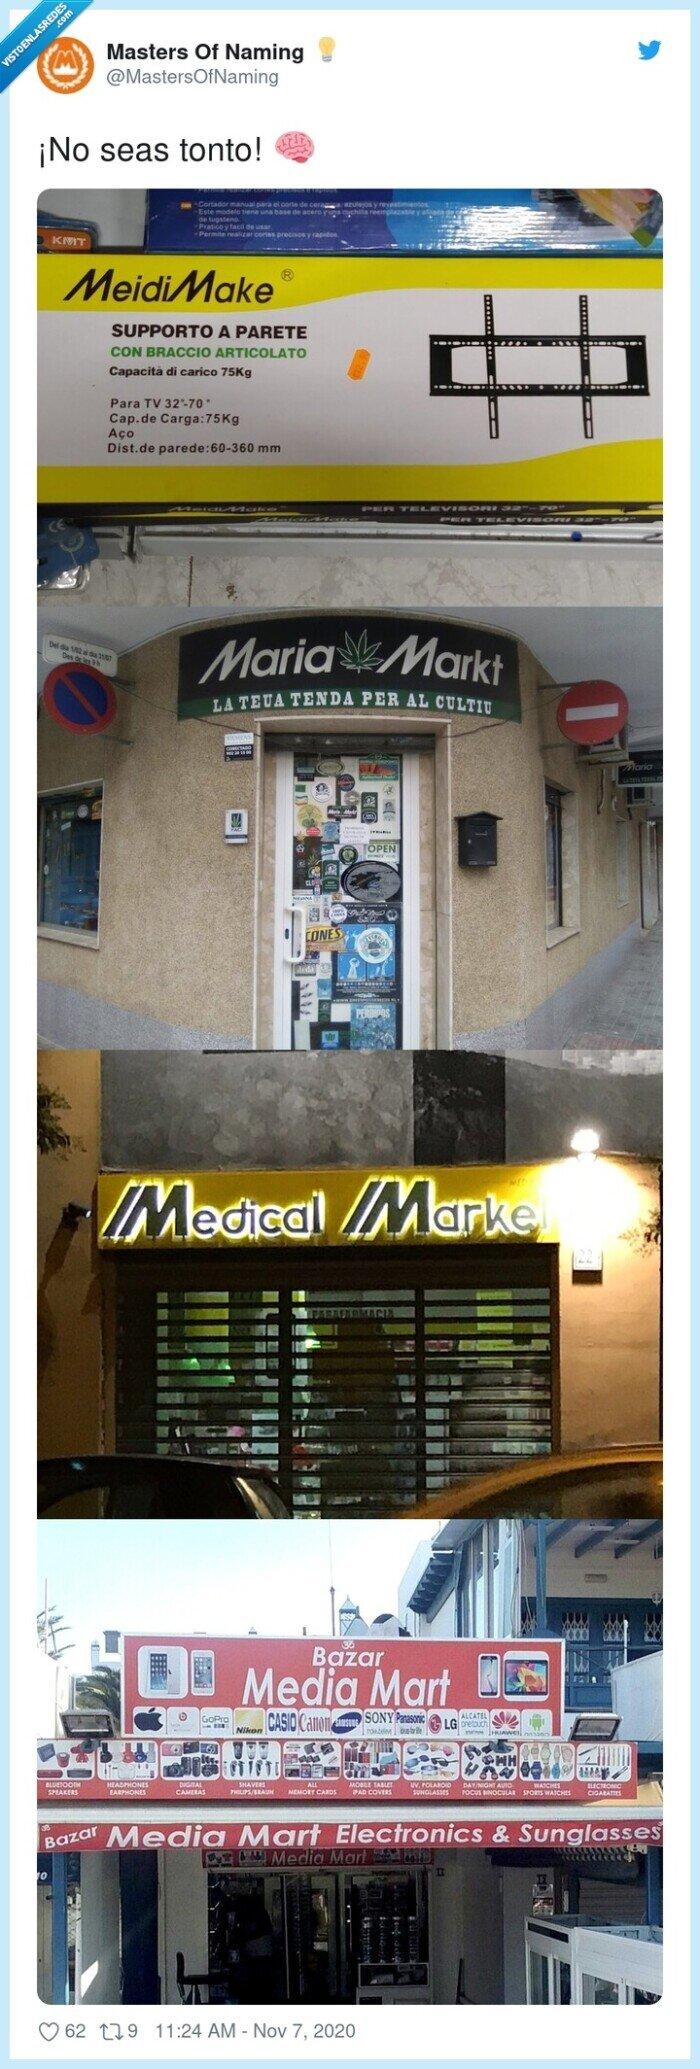 mediamarkt,naming,negocios